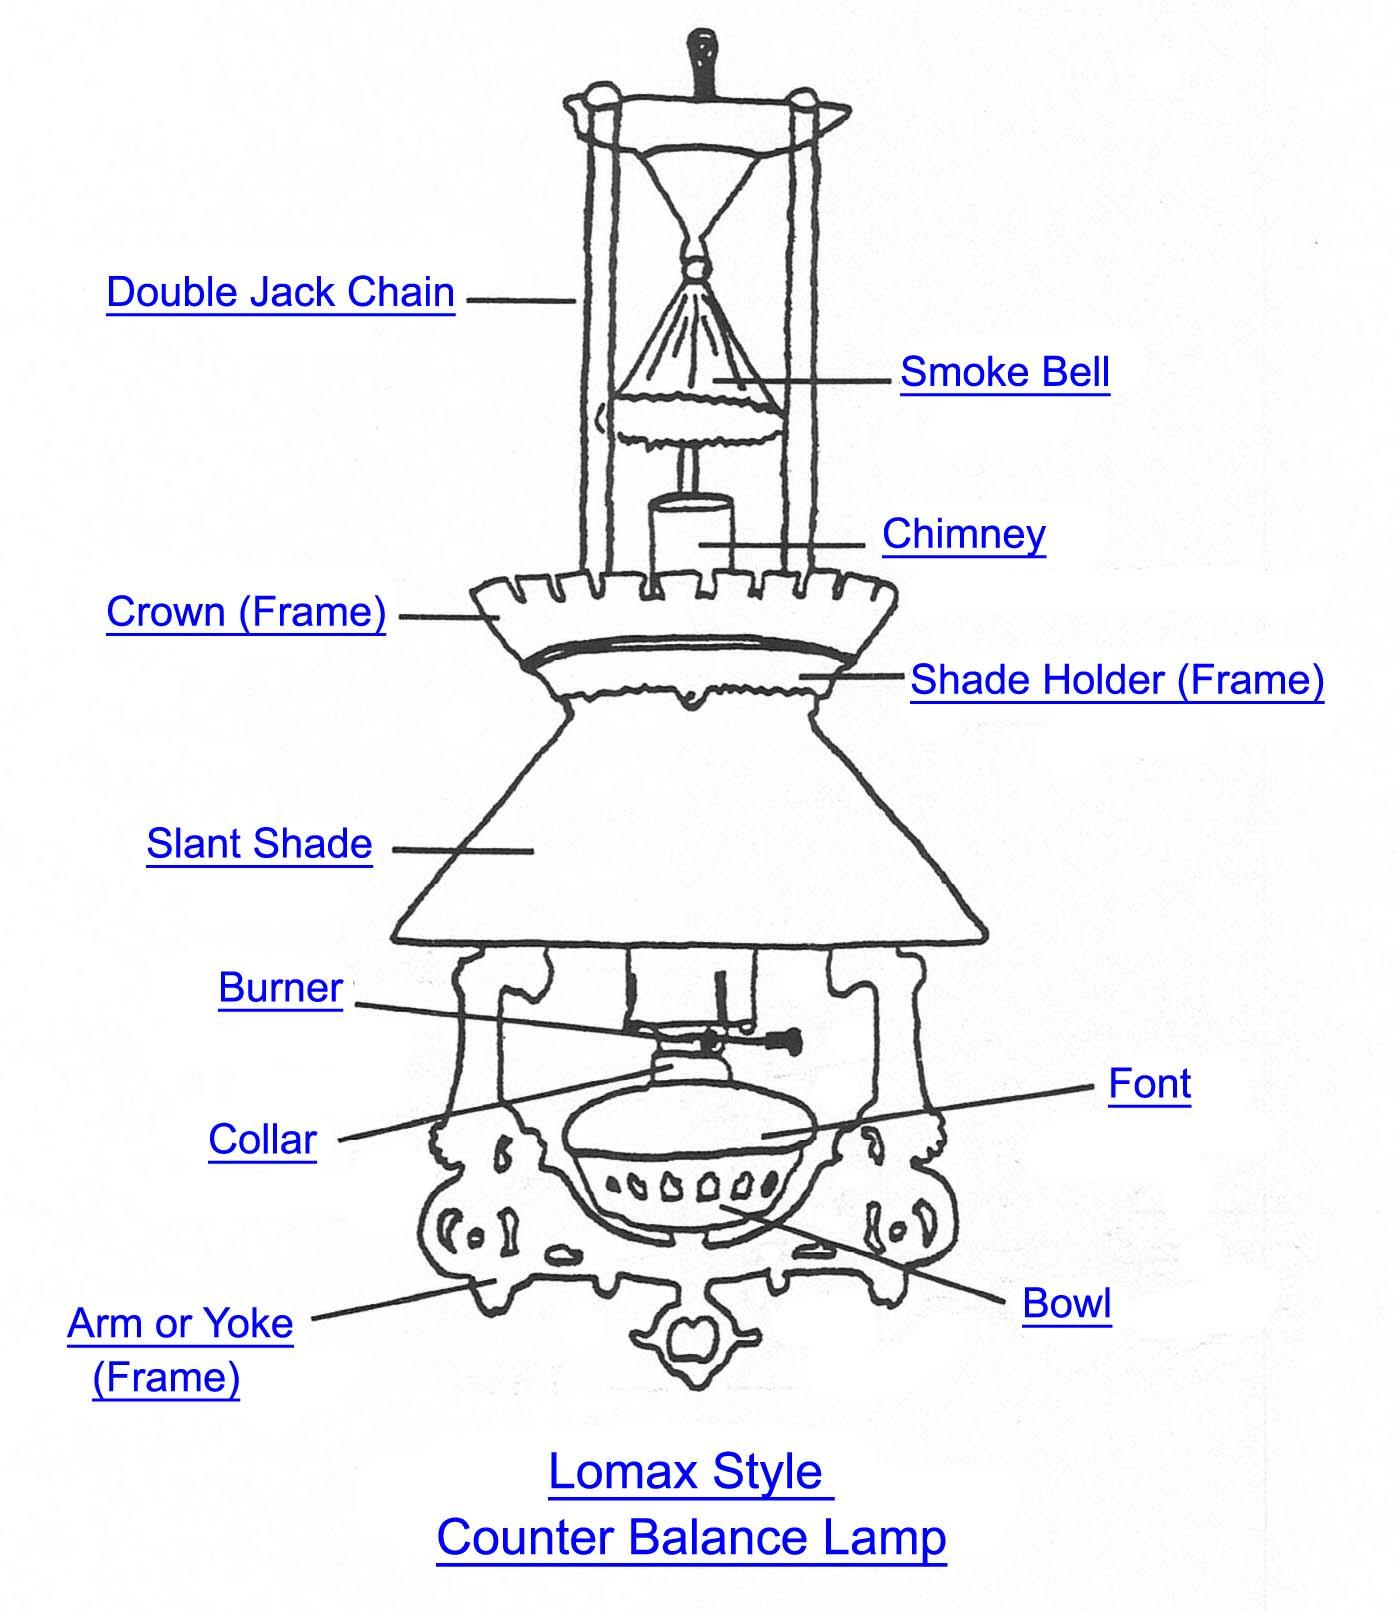 lomax counter balance lamp part index